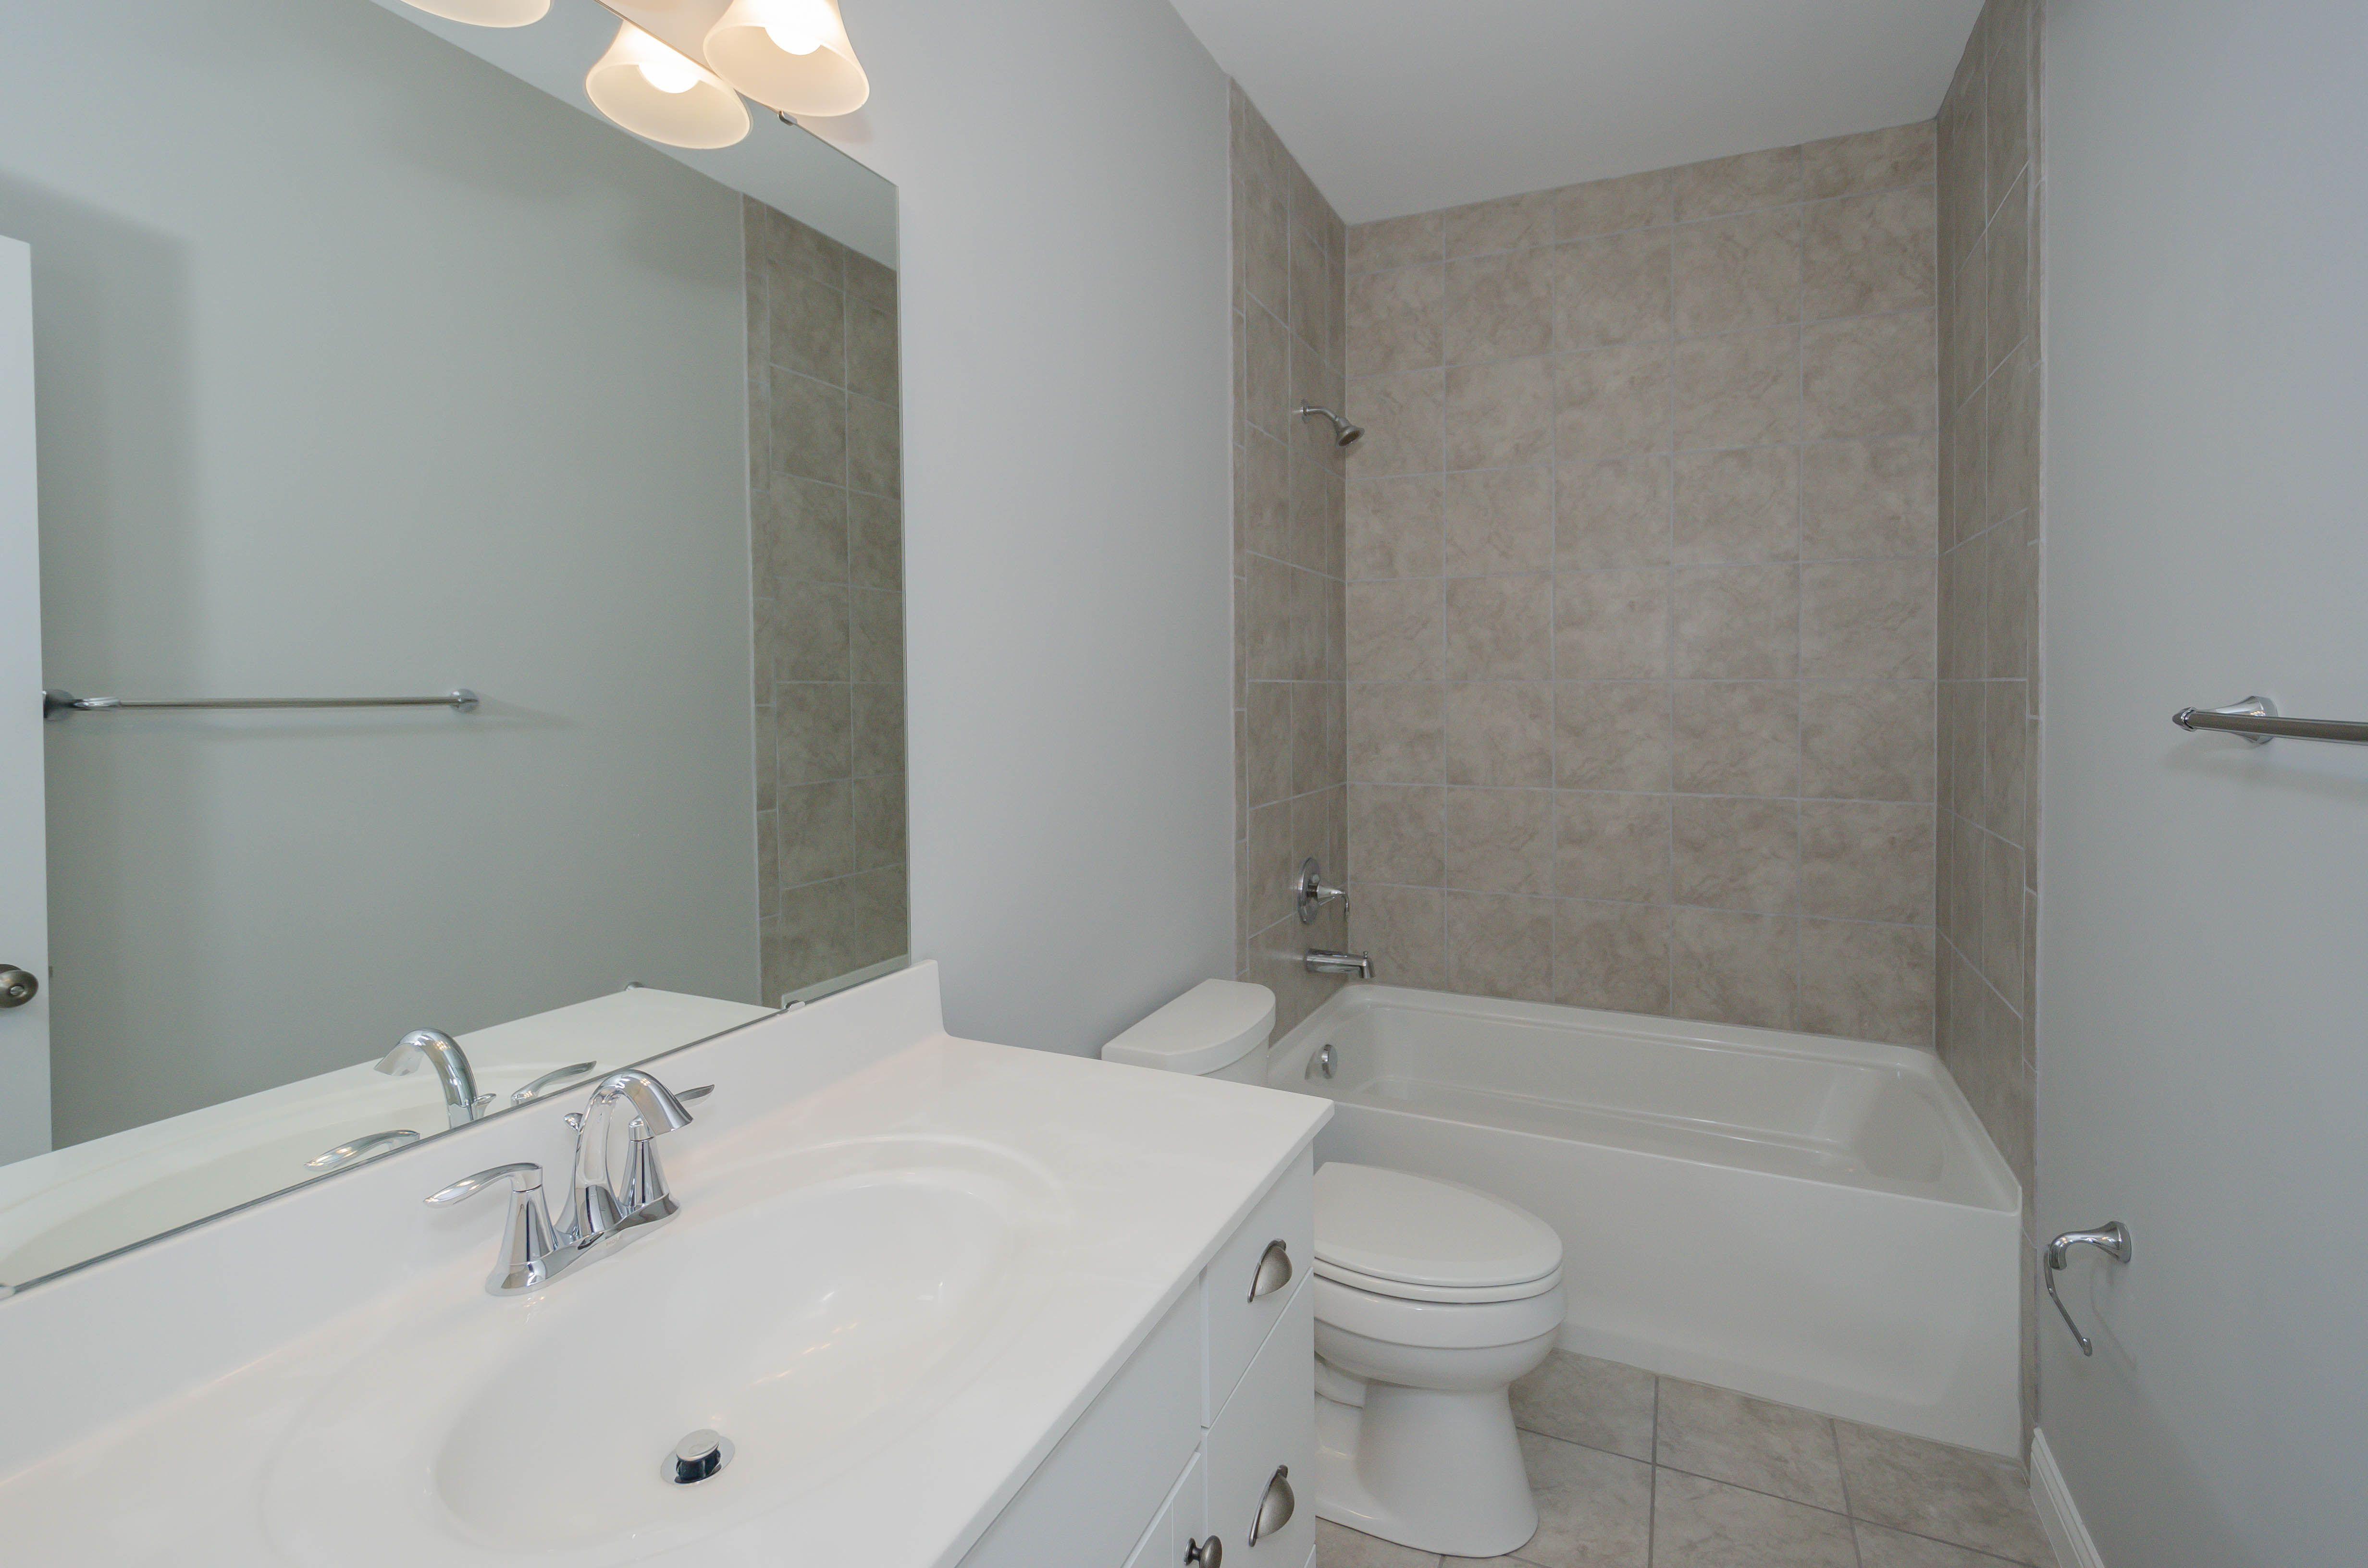 Best 11 Swirl Brellin White Cabinets Marble Bath Tile 400 x 300